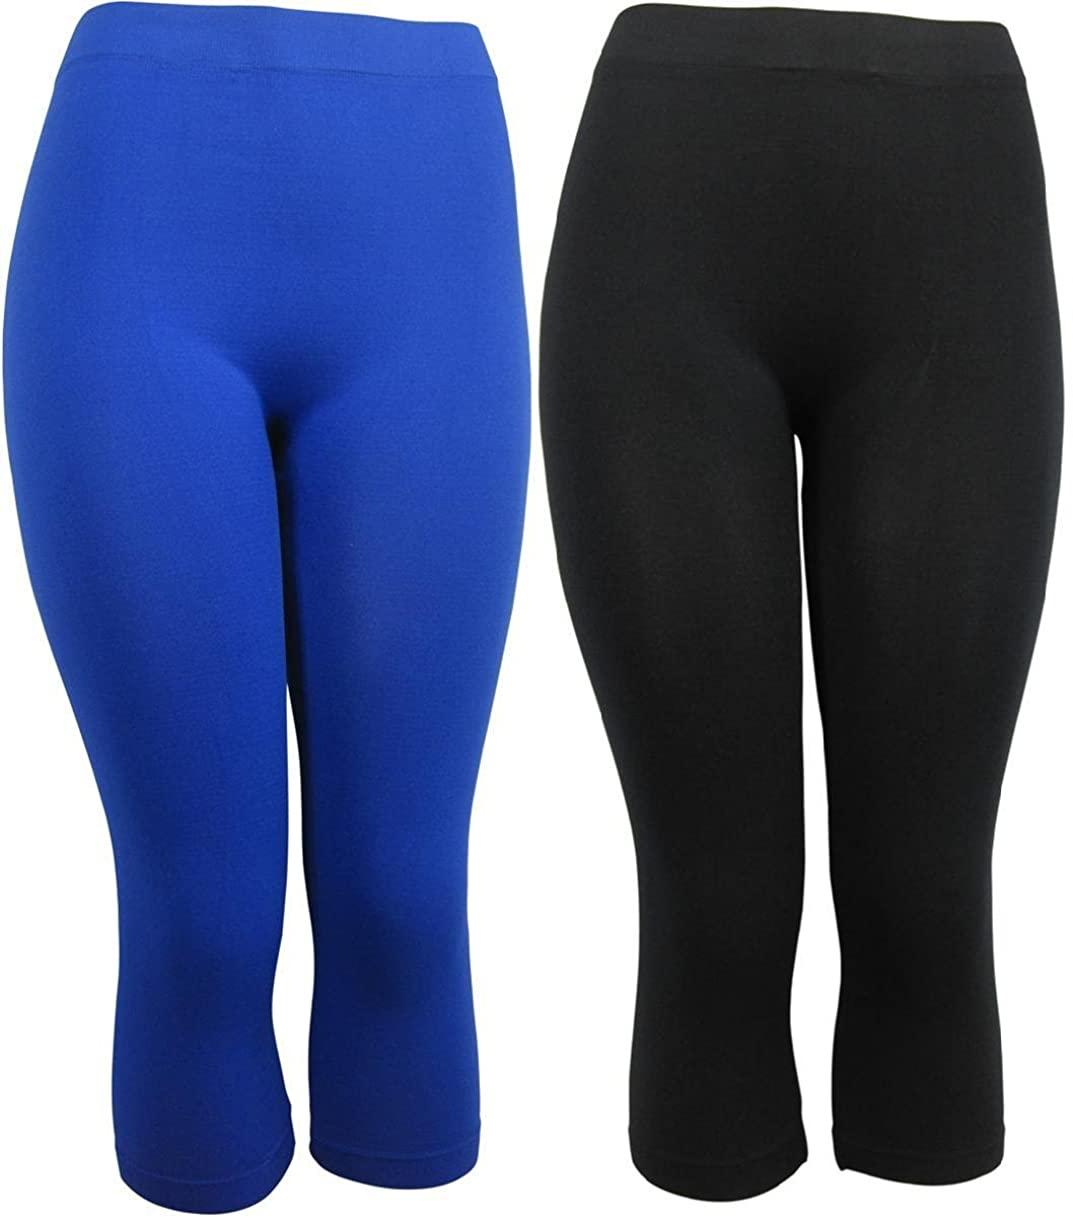 J Ann 2-Piece/Pack Women's Seamless Capri Leggings, Free Size,